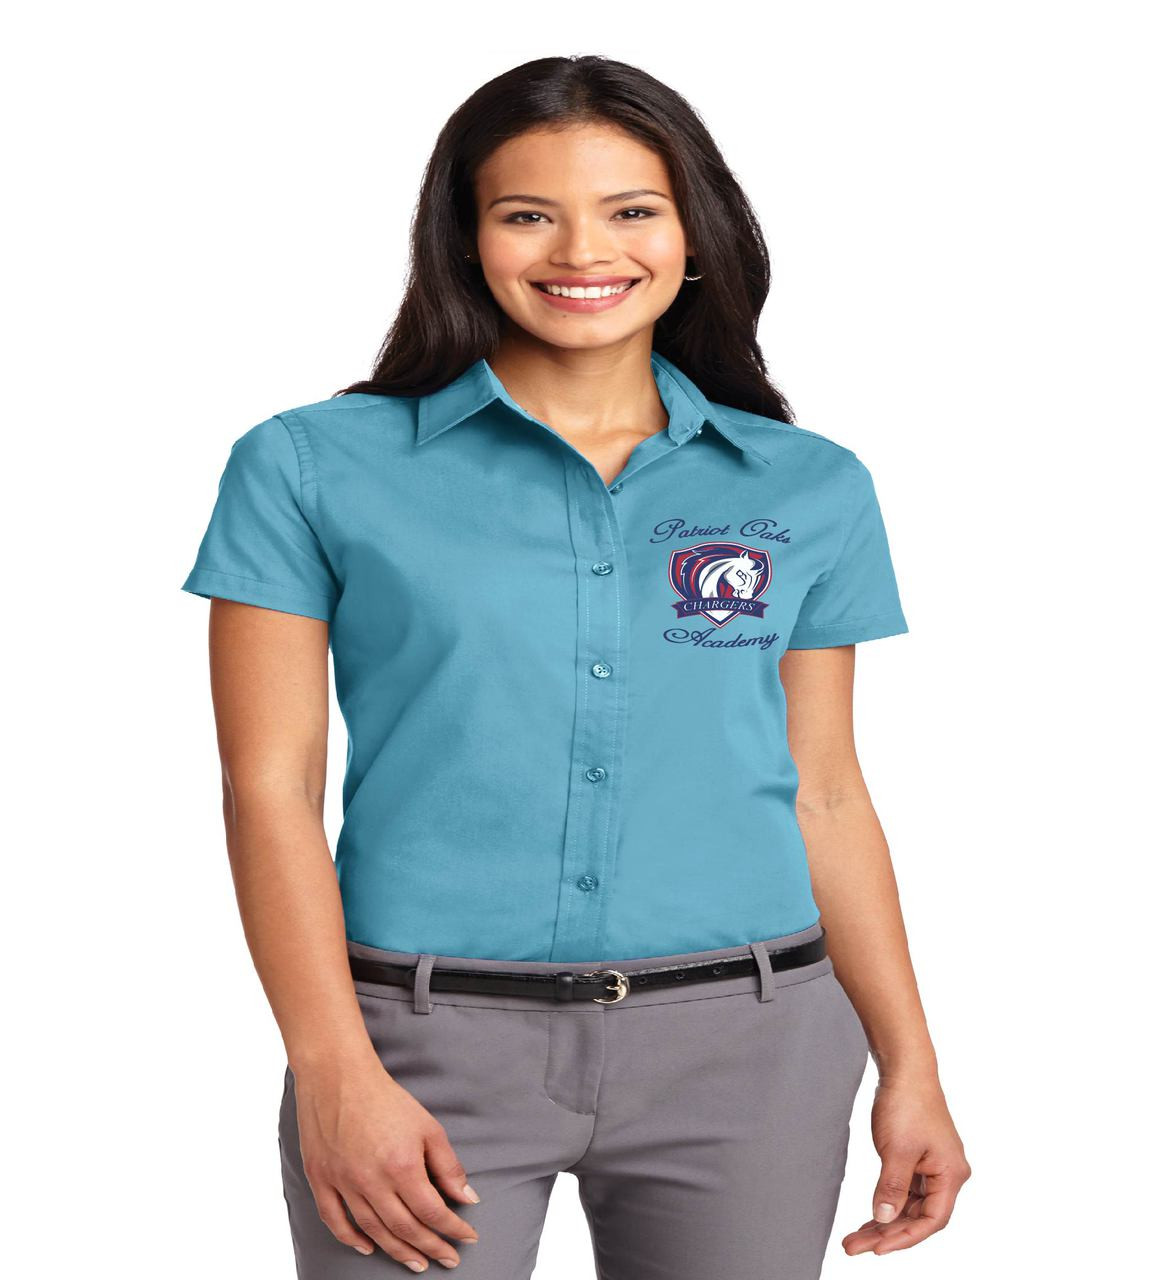 f2a612cb Patriot Oaks Ladies Short Sleeve Button-up - spirit wear